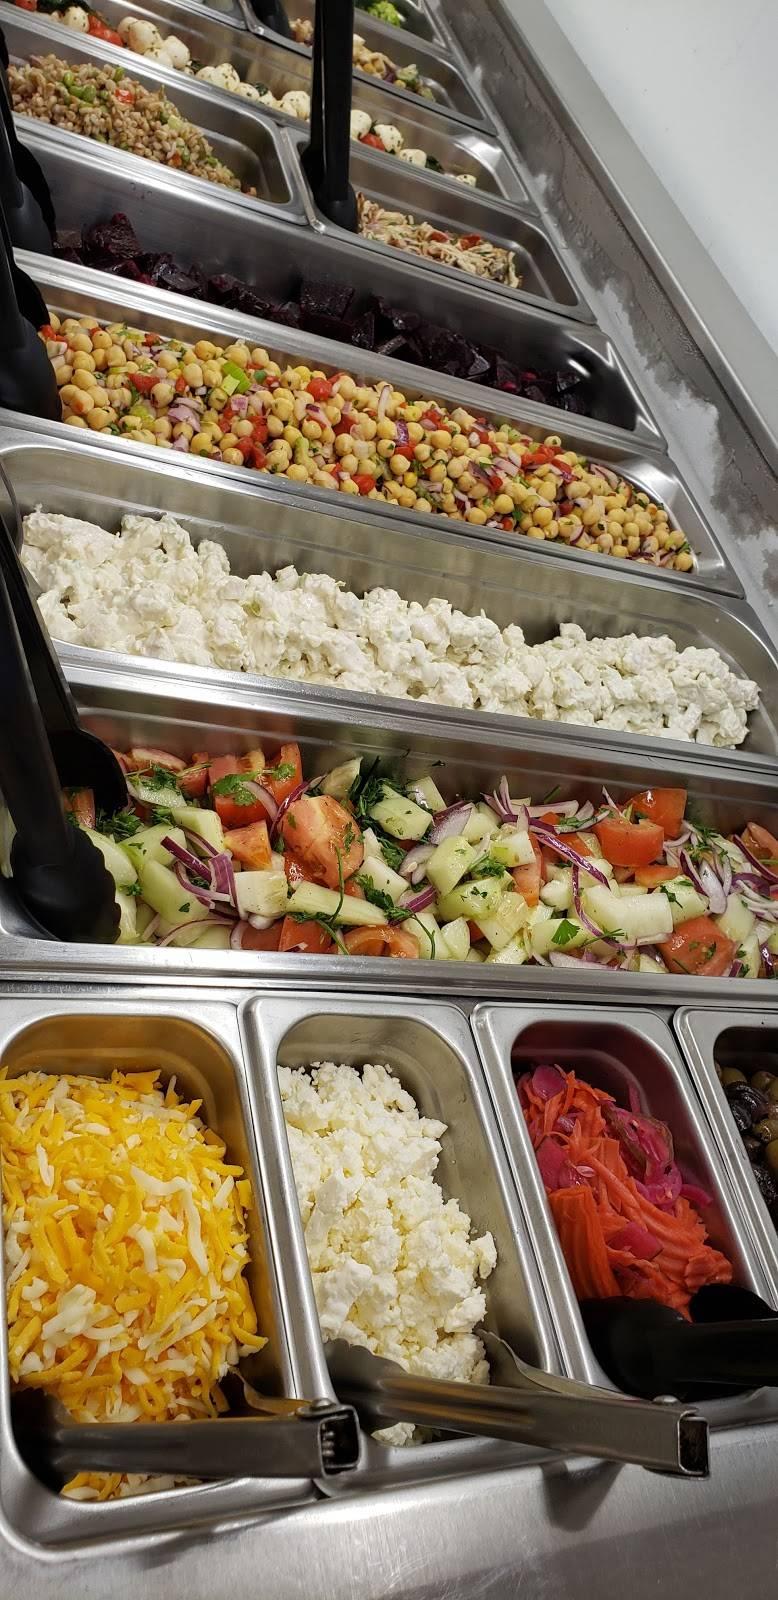 Skyline Gourmet   restaurant   125 Chubb Ave # 1, Lyndhurst, NJ 07071, USA   2019393663 OR +1 201-939-3663